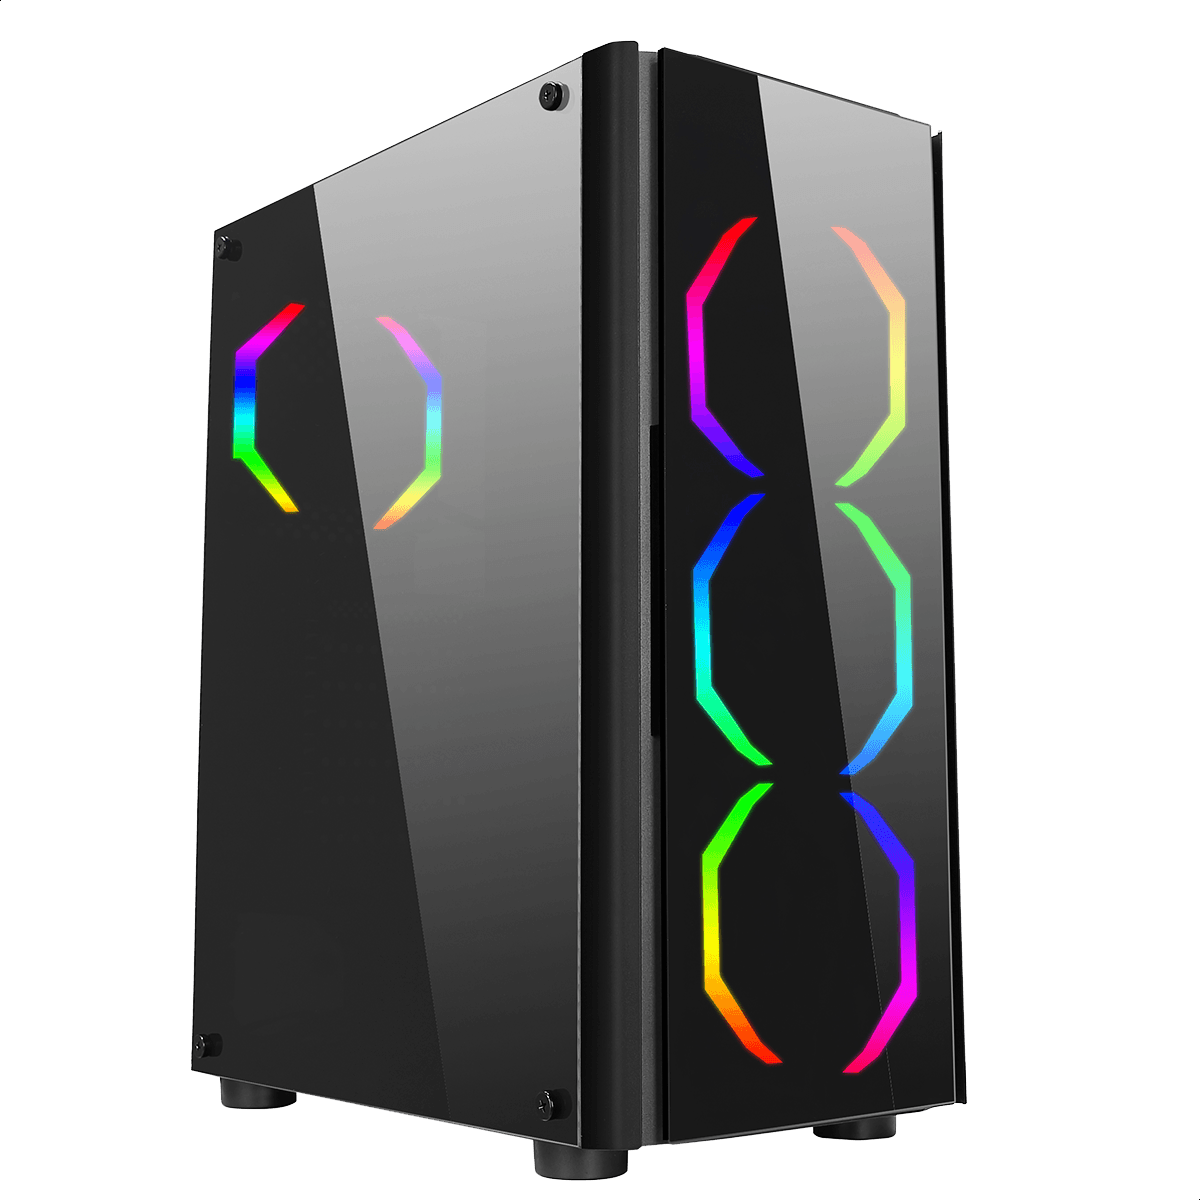 Computador Gamer Infohard AMD Ryzen 5 3600, 16GB DDR4, 500GB SSD, GTX1050TI 4GB, 550W, B450M - 635891